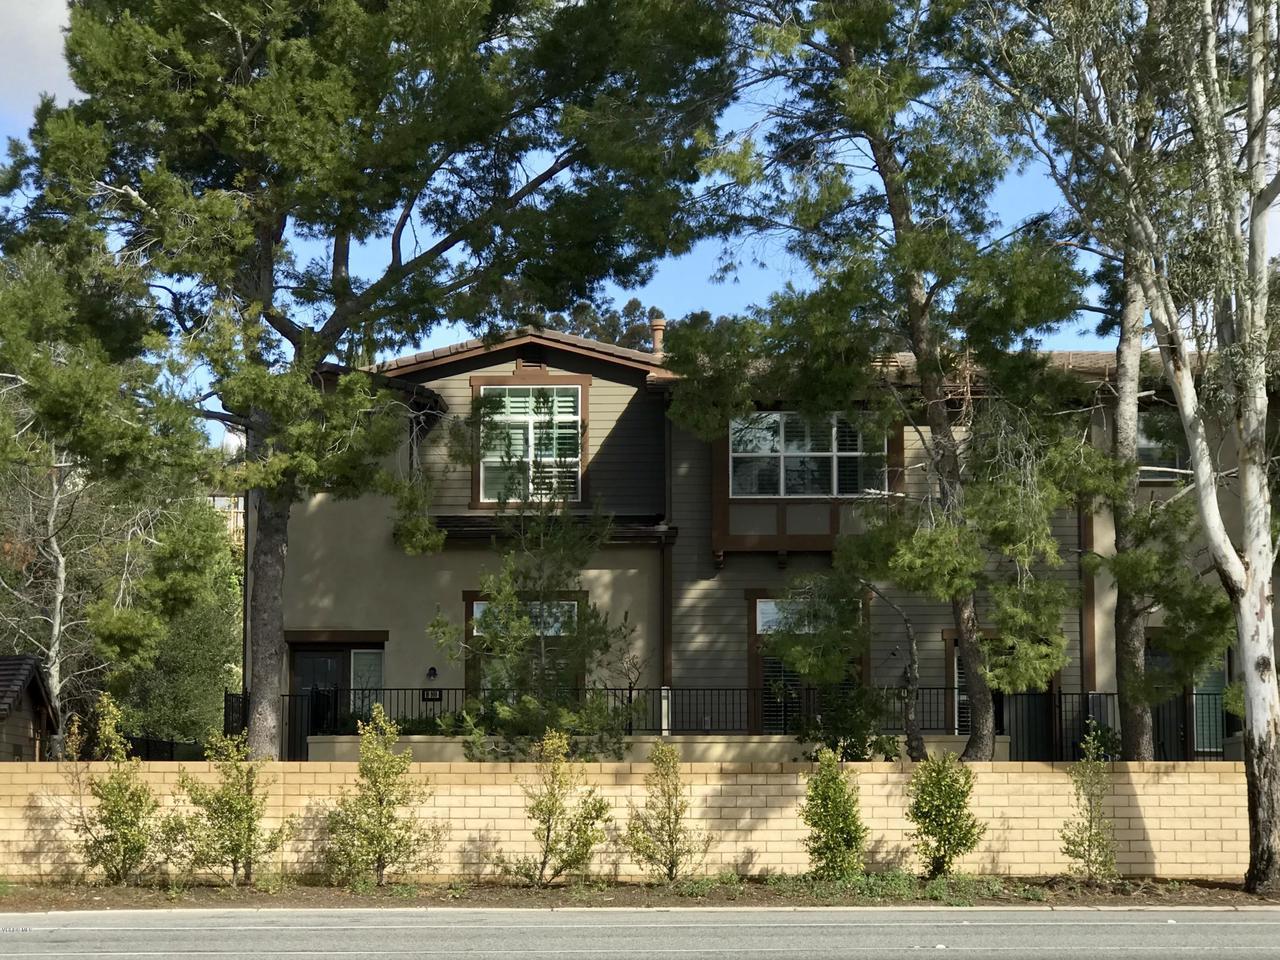 Photo of 692 TENNIS CLUB LANE, Thousand Oaks, CA 91360